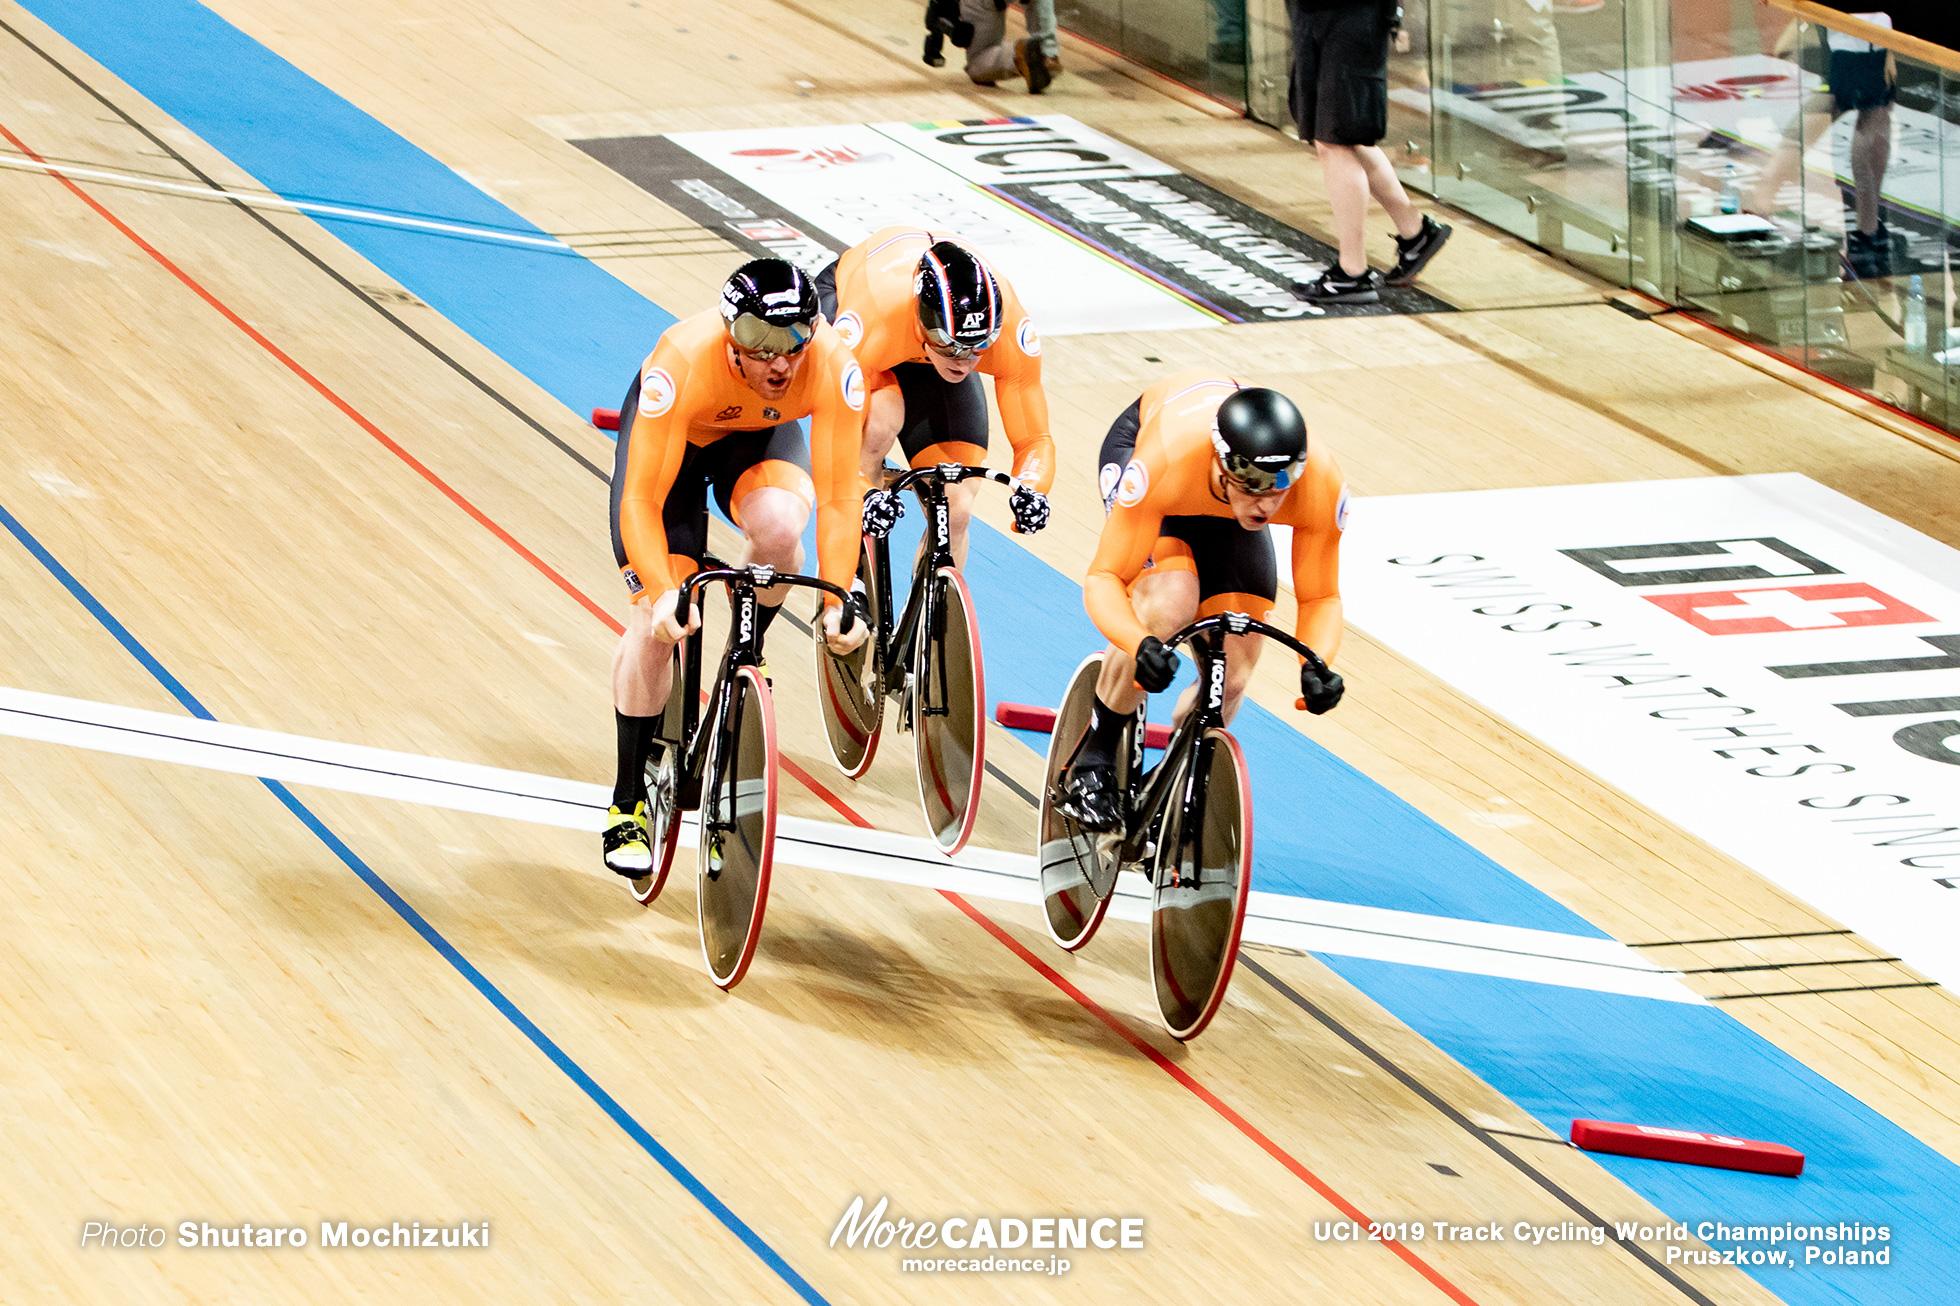 Men's Team Sprint Final / 2019 Track Cycling World Championships Pruszków, Poland